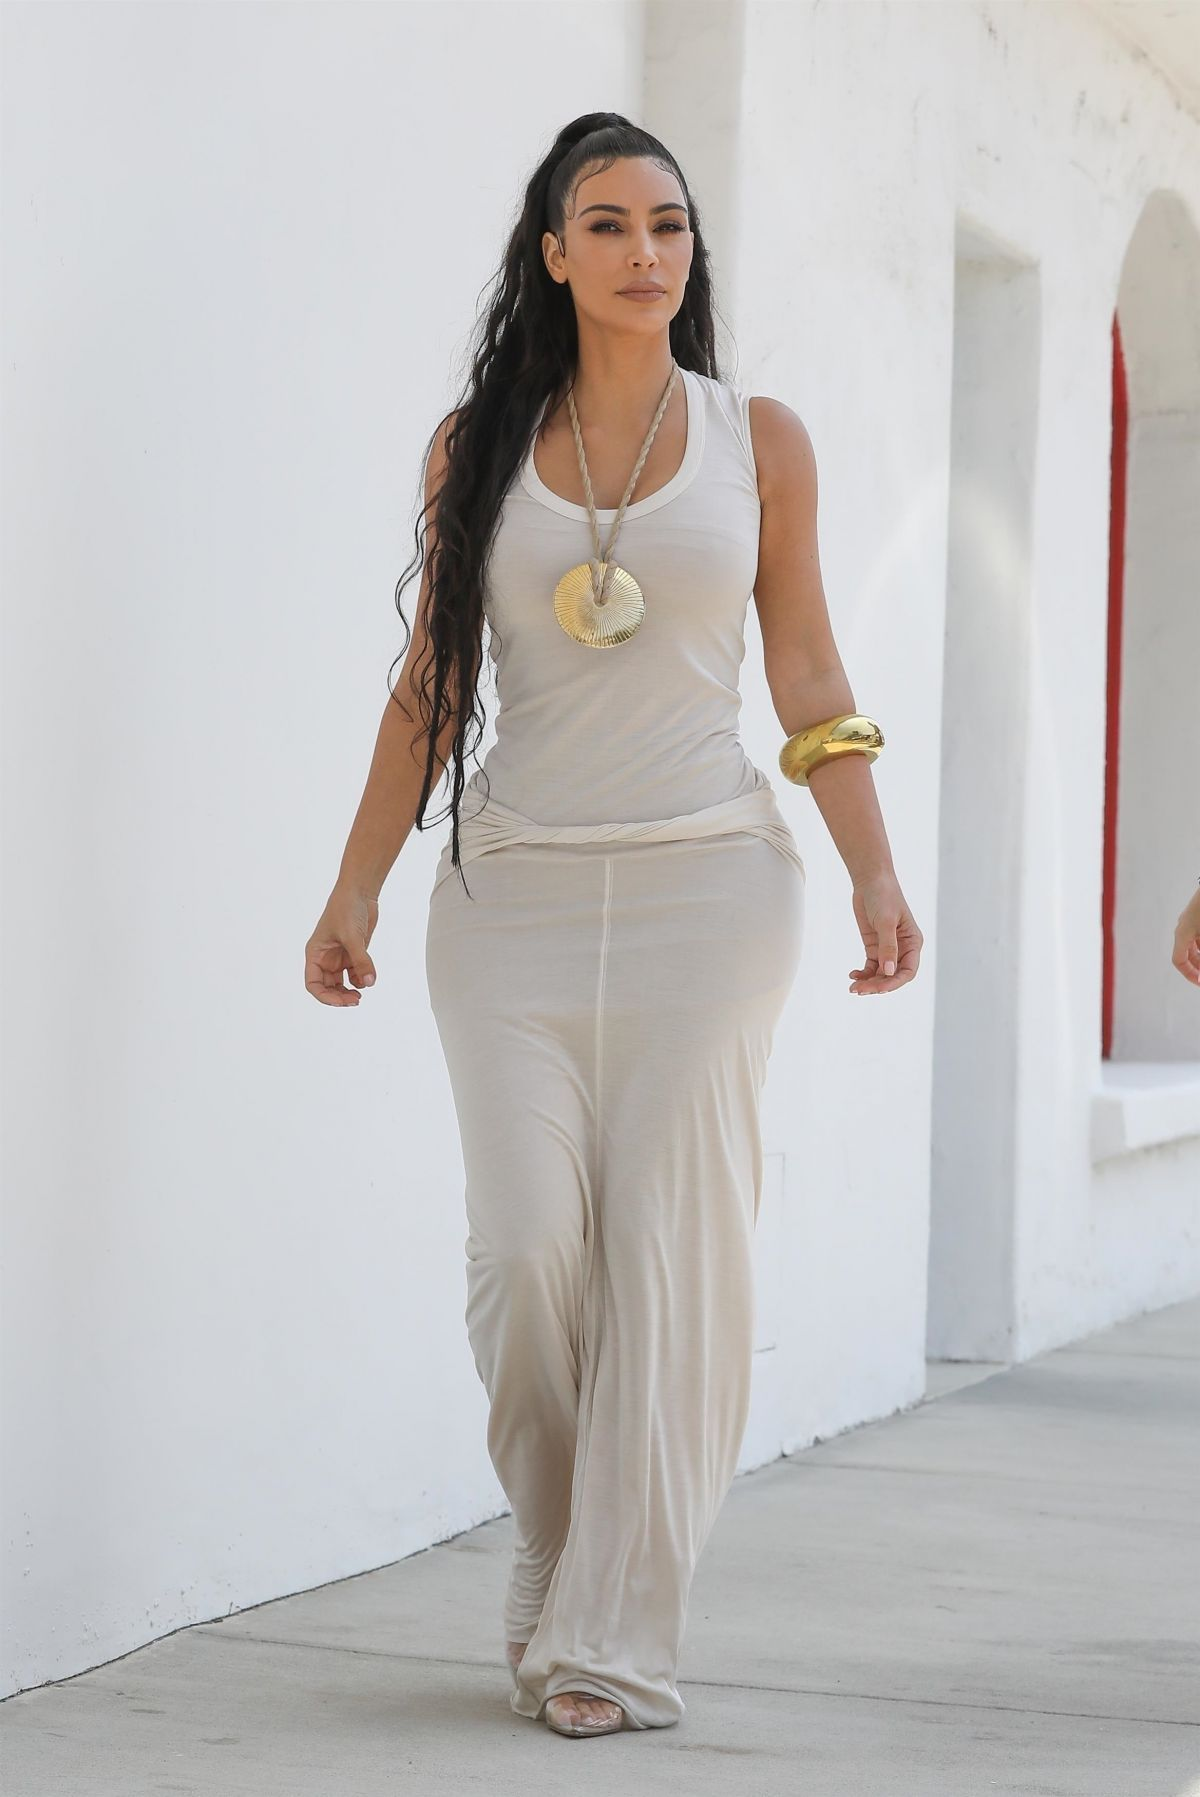 Kim kardashian, Kardashian dresses and Dress clothes on